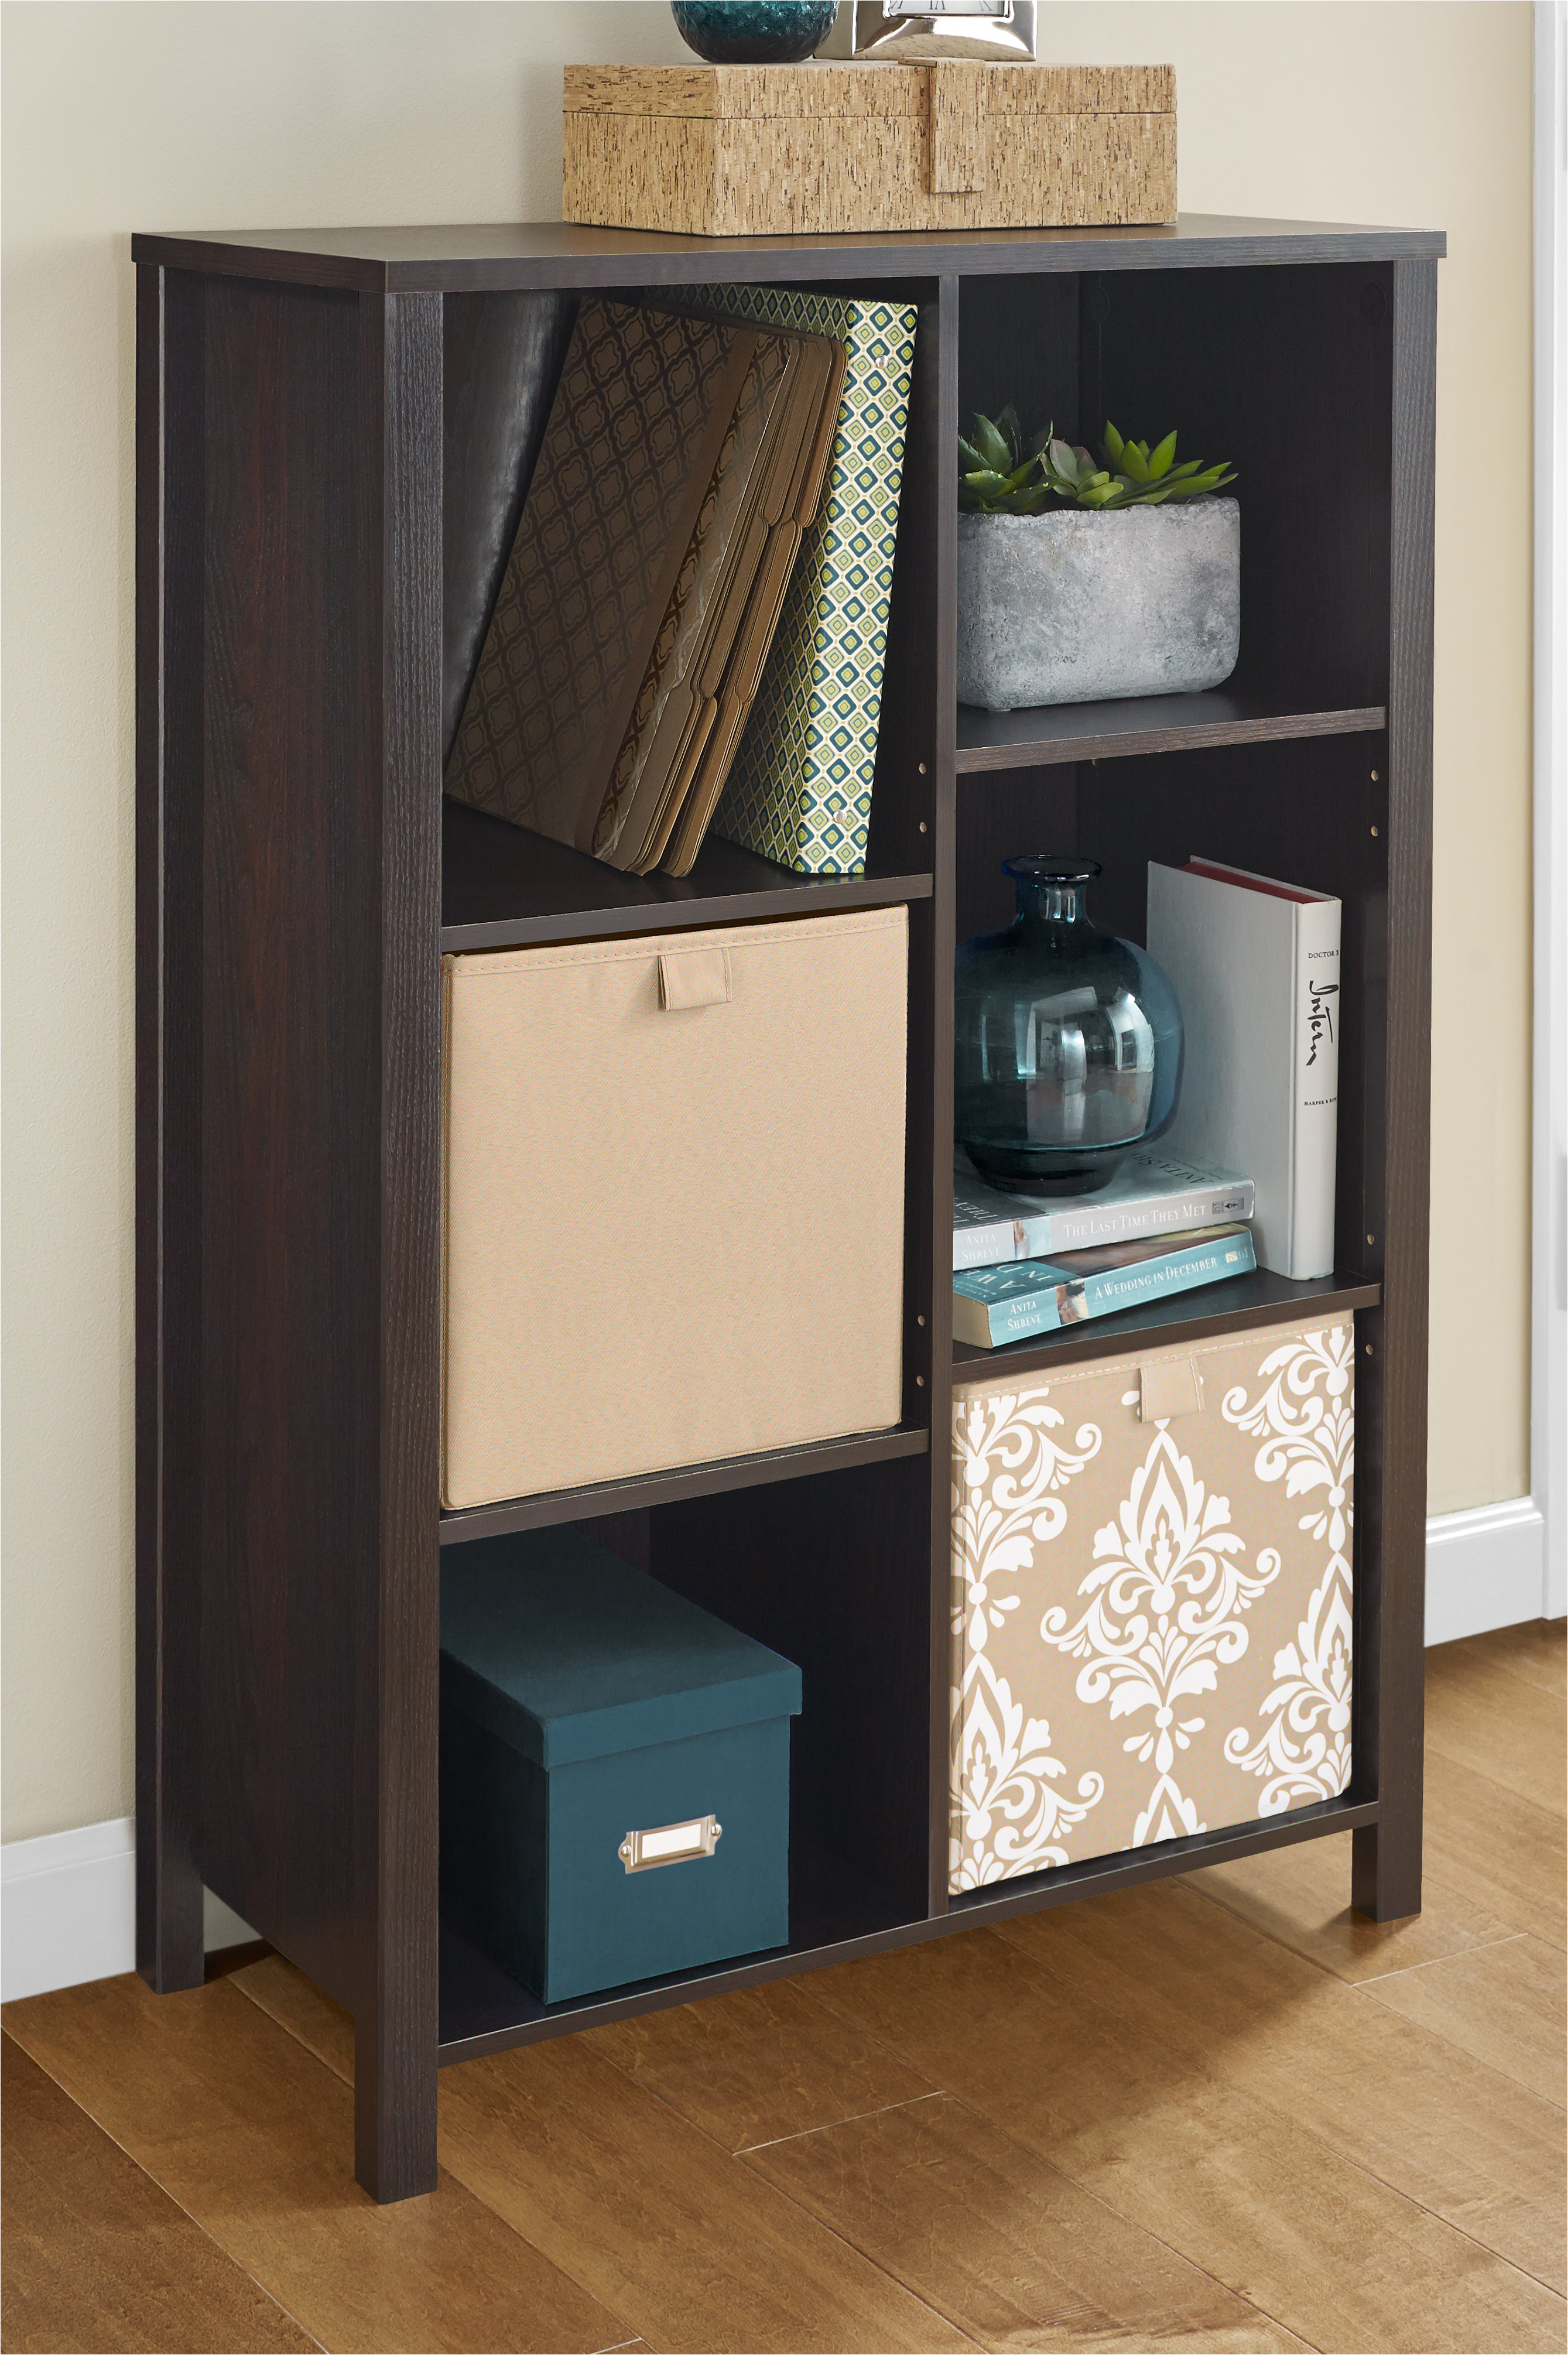 Room Essentials 5 Shelf Bookcase assembly Instructions Pdf Closetmaid Premium Cubes Adjustable Unit Bookcase Reviews Wayfair